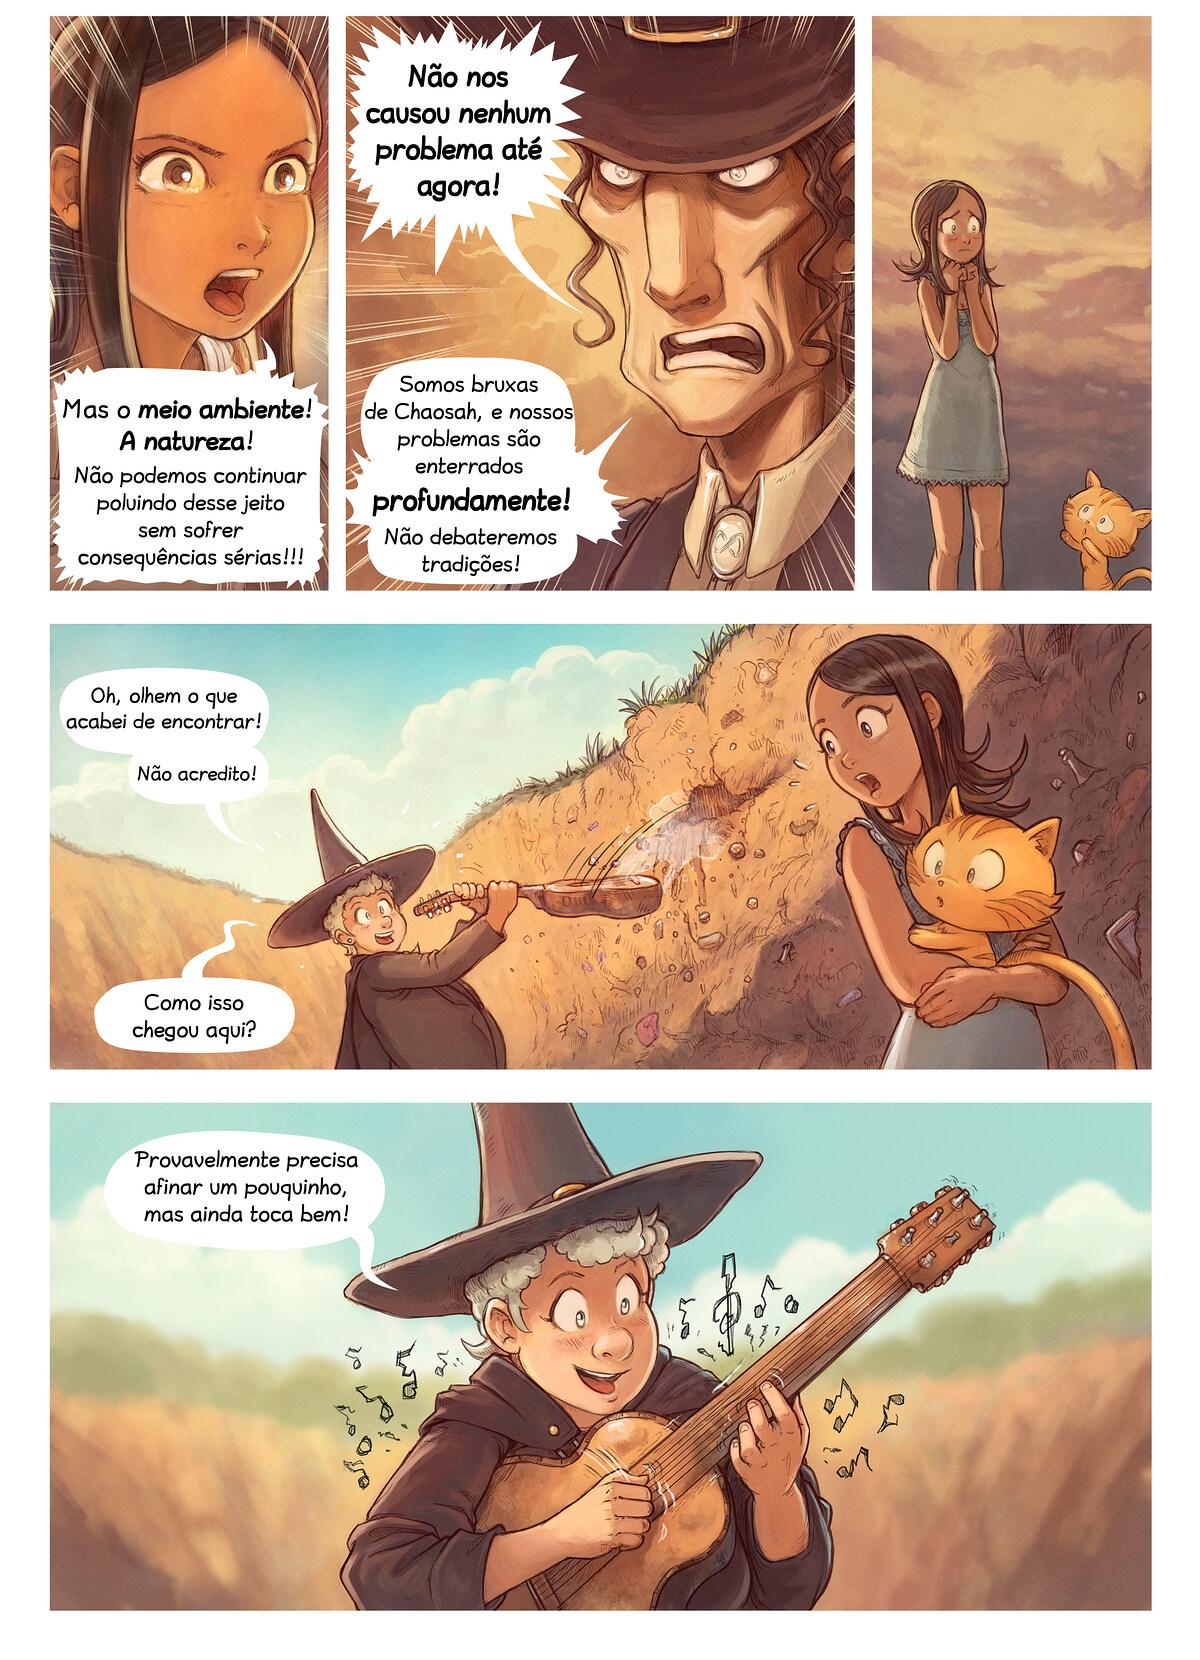 A webcomic page of Pepper&Carrot, episódio 19 [pt], página 6